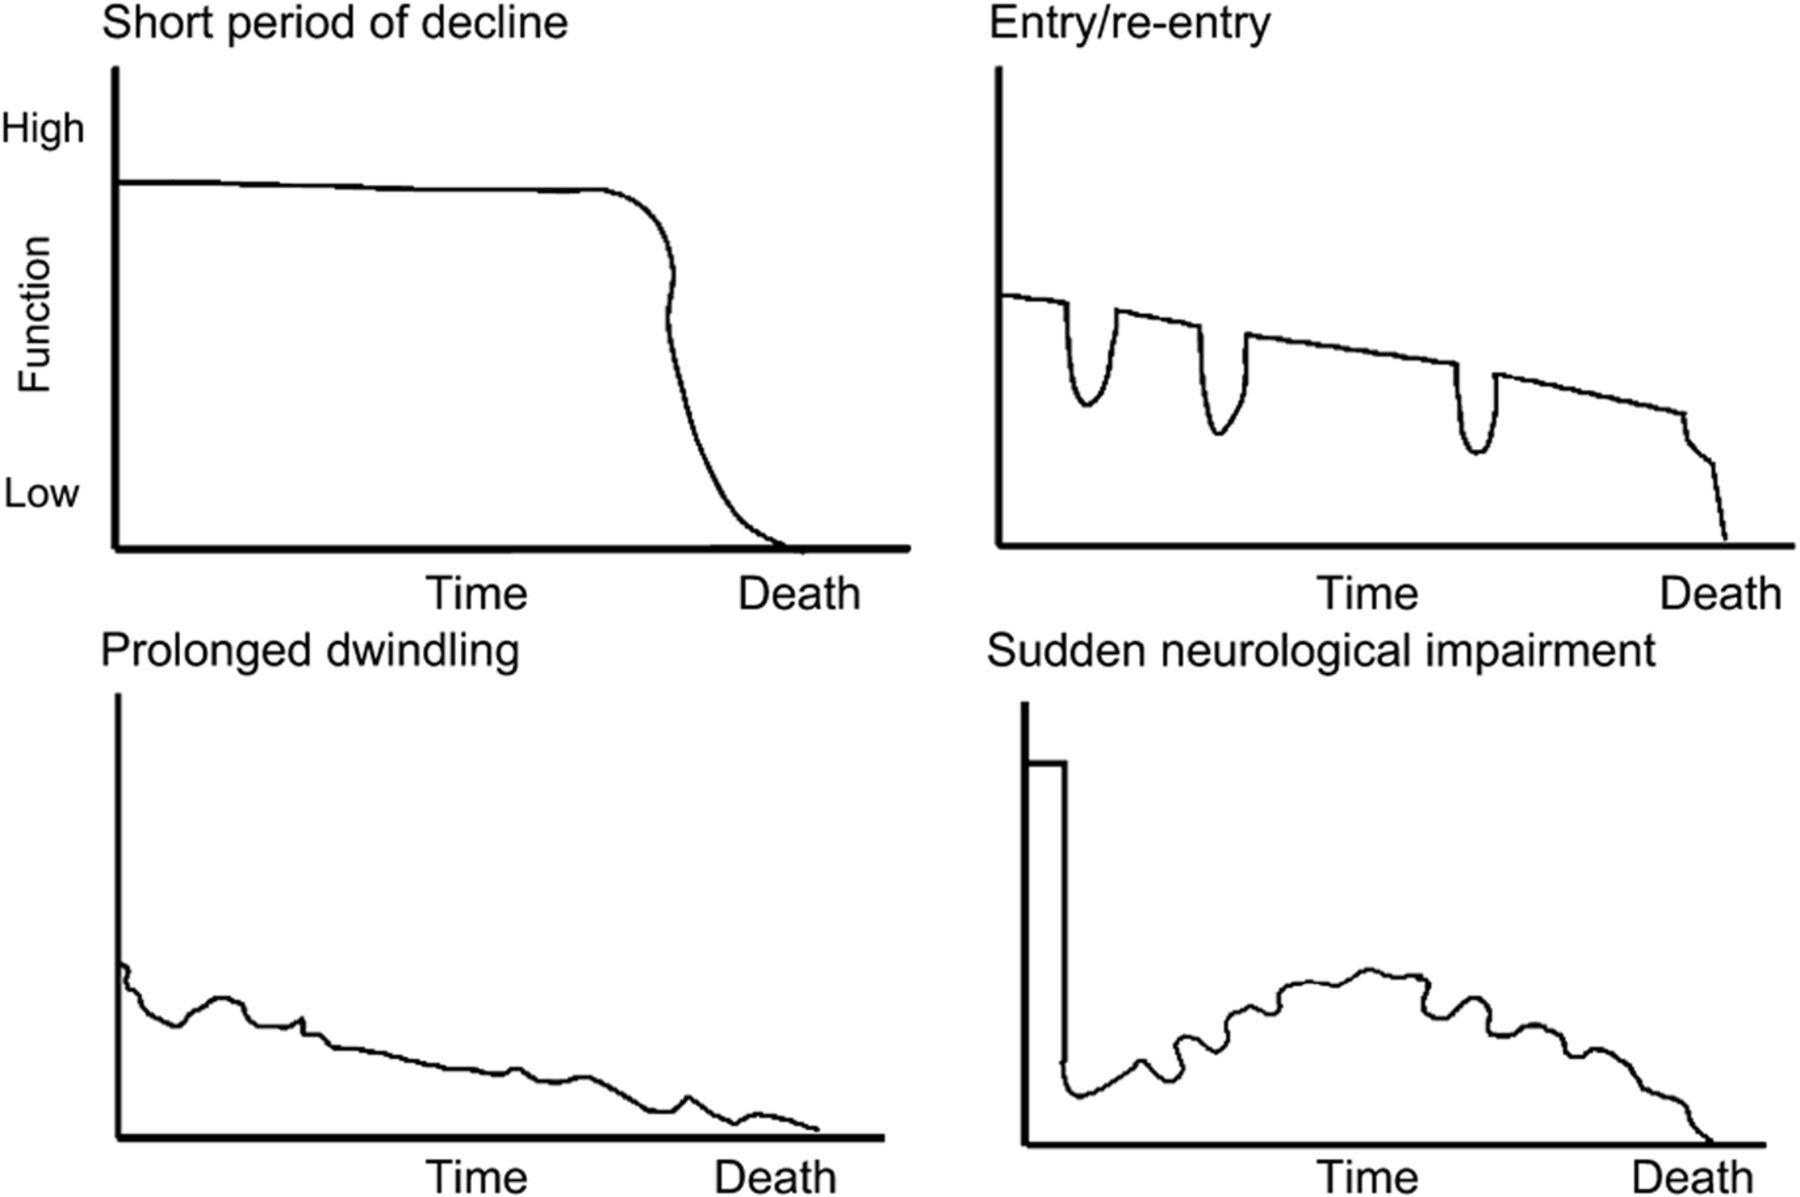 estimating and communicating prognosis in advanced neurologic